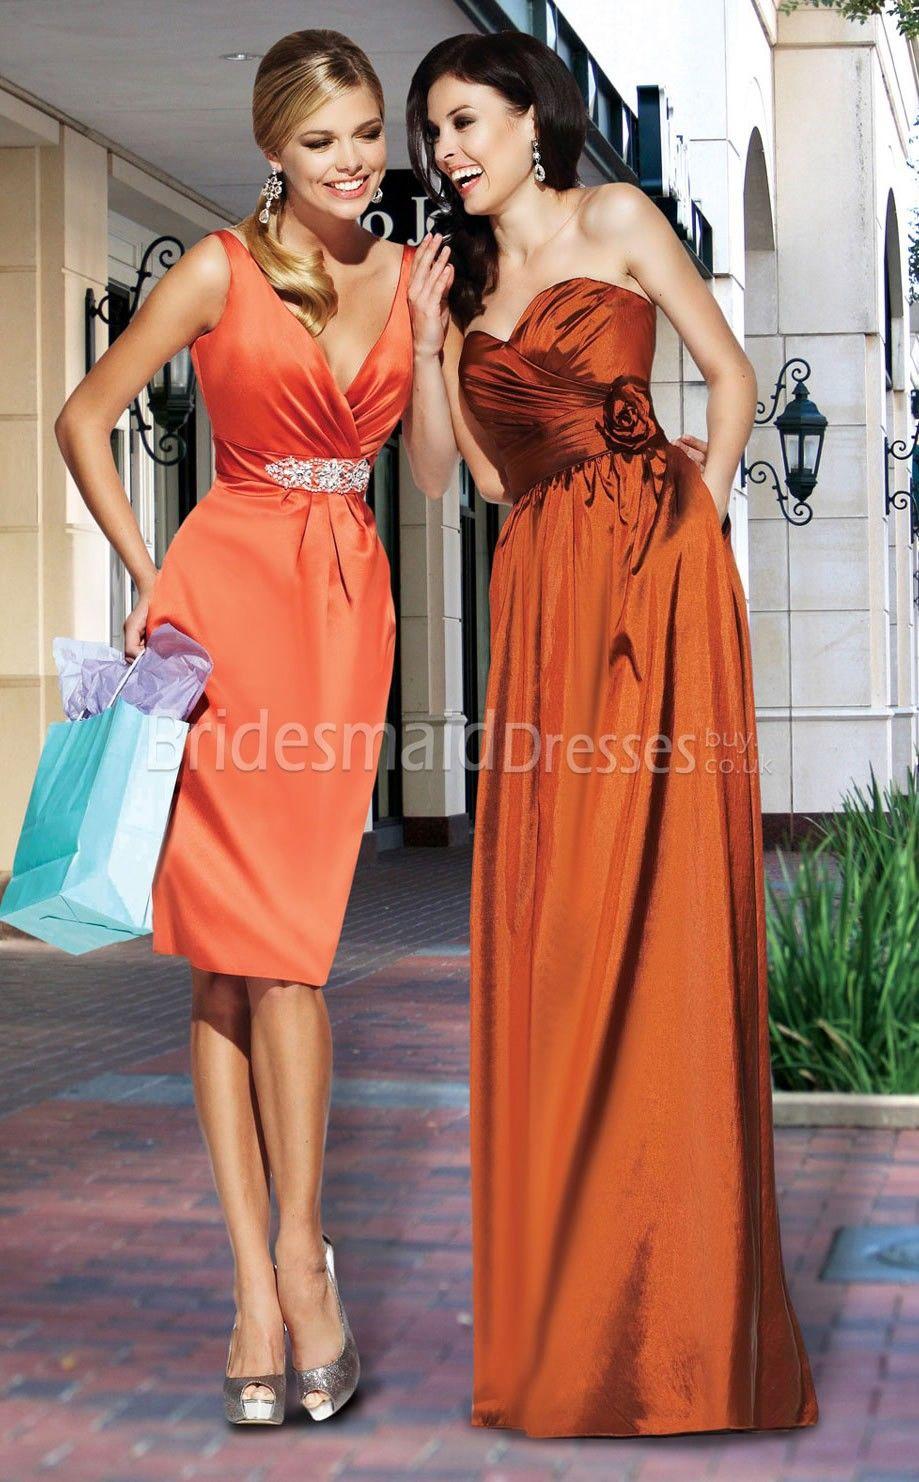 Beautiful street stylered bridesmaid dresseslong bridesmaid